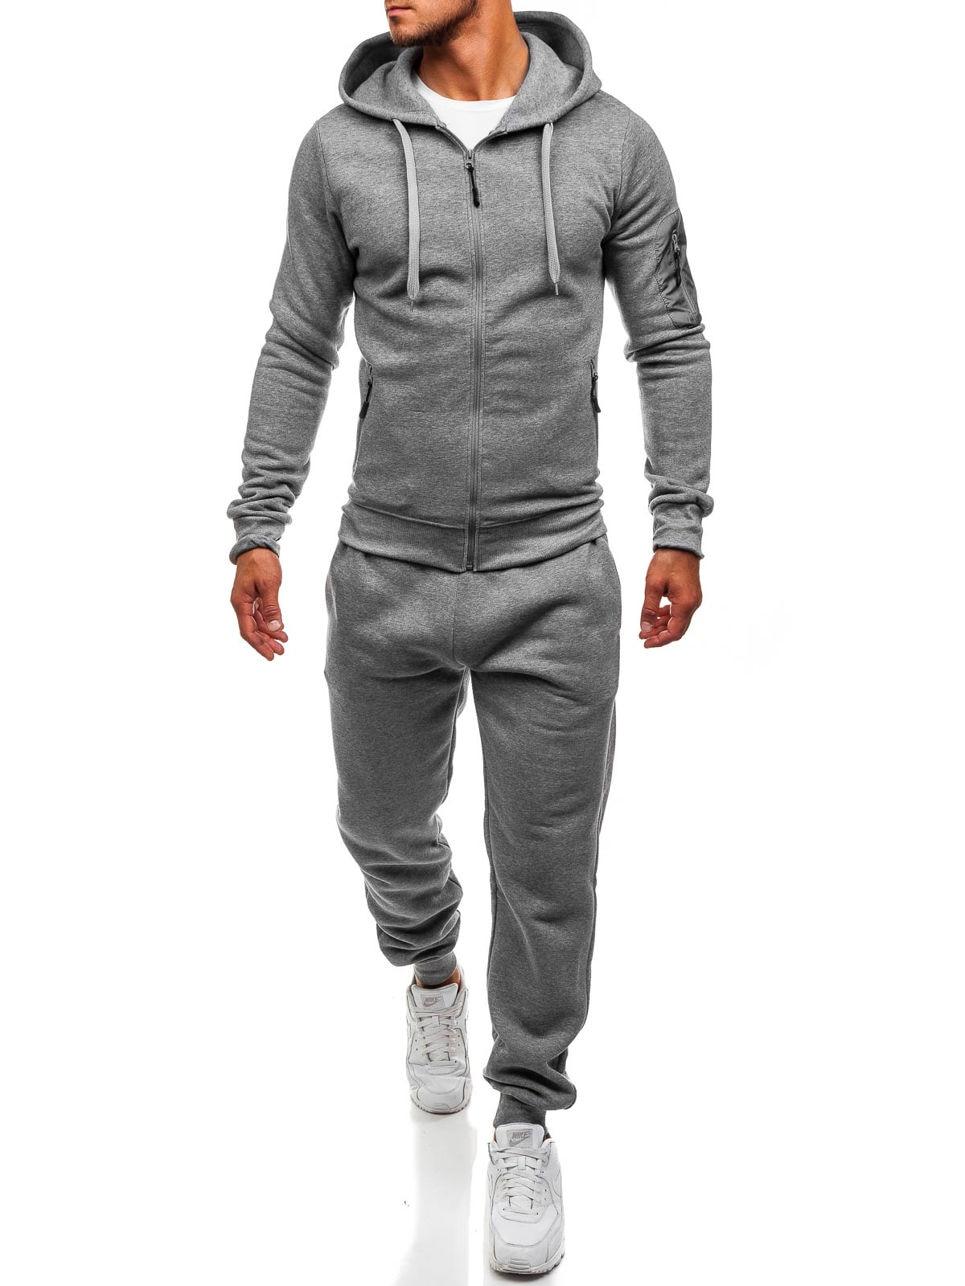 ZOGAA 2019 Spring Hot Sale Men's Sports And Leisure Slim Joggers SweatSuits Hoodies+Pants Suit CSweatshirt Sportswear Set 2pc